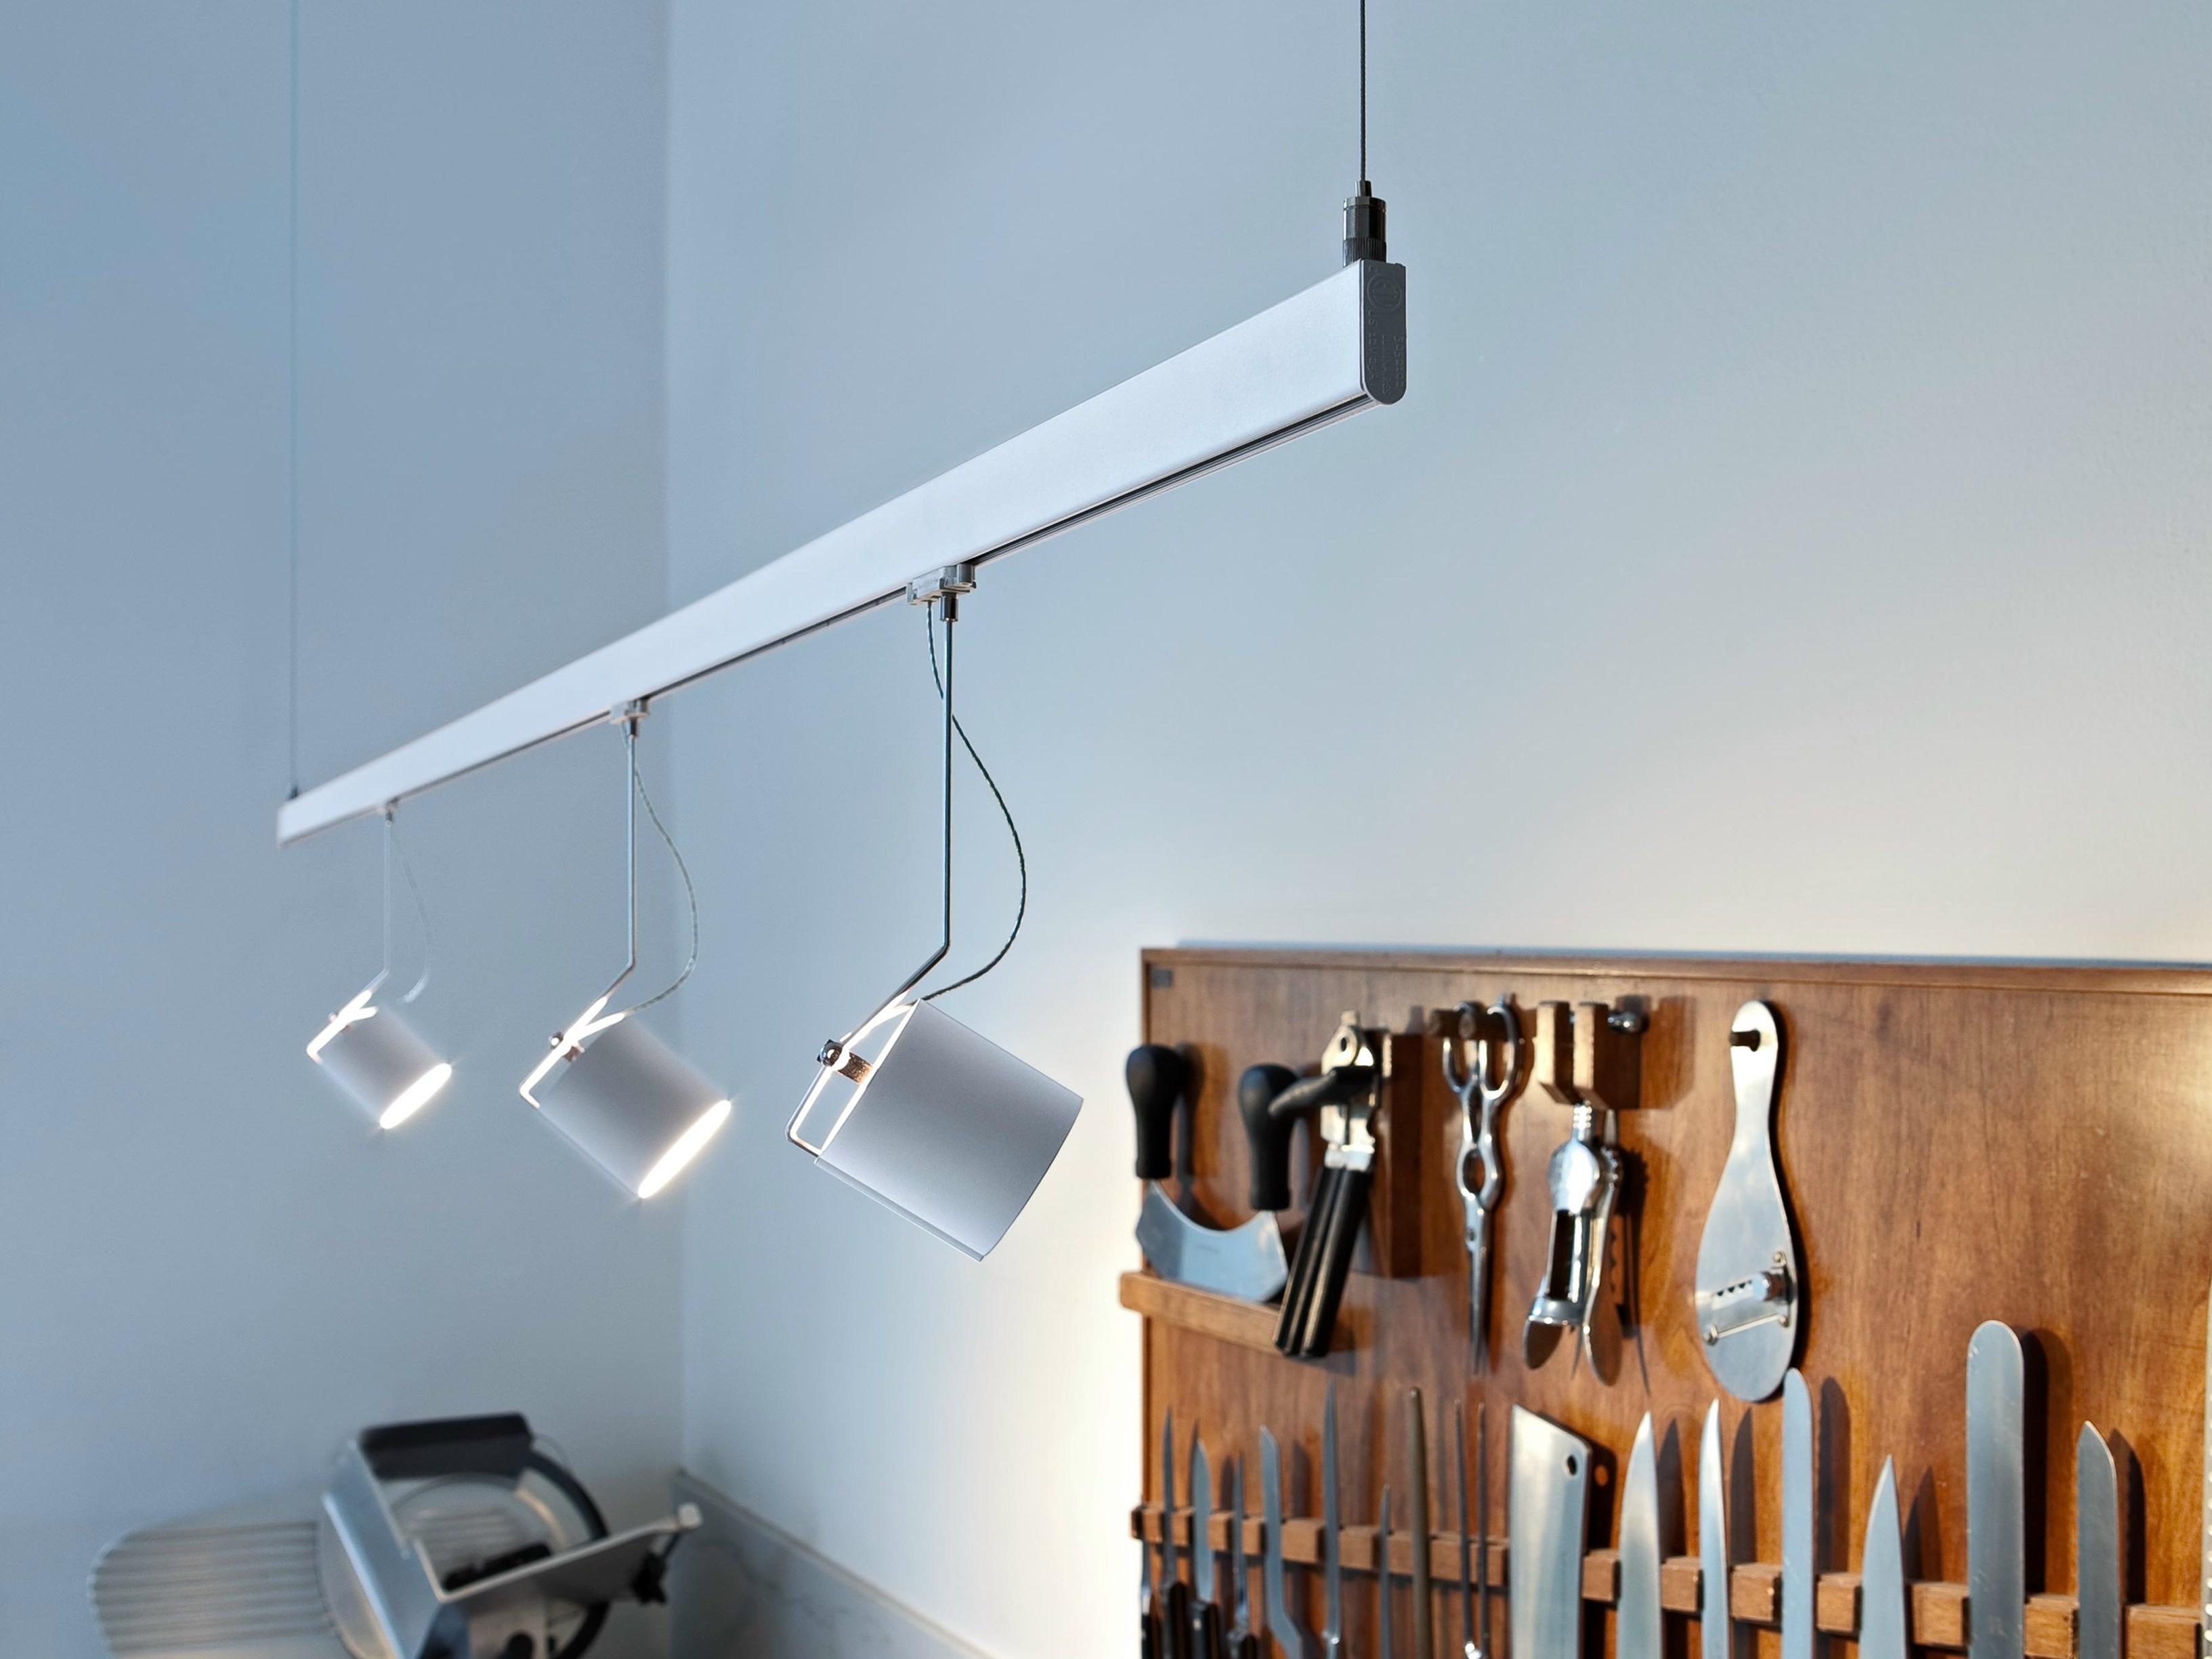 interior led light led aluminium track best track lighting pendant design idea track lights in kitchen pendant track light